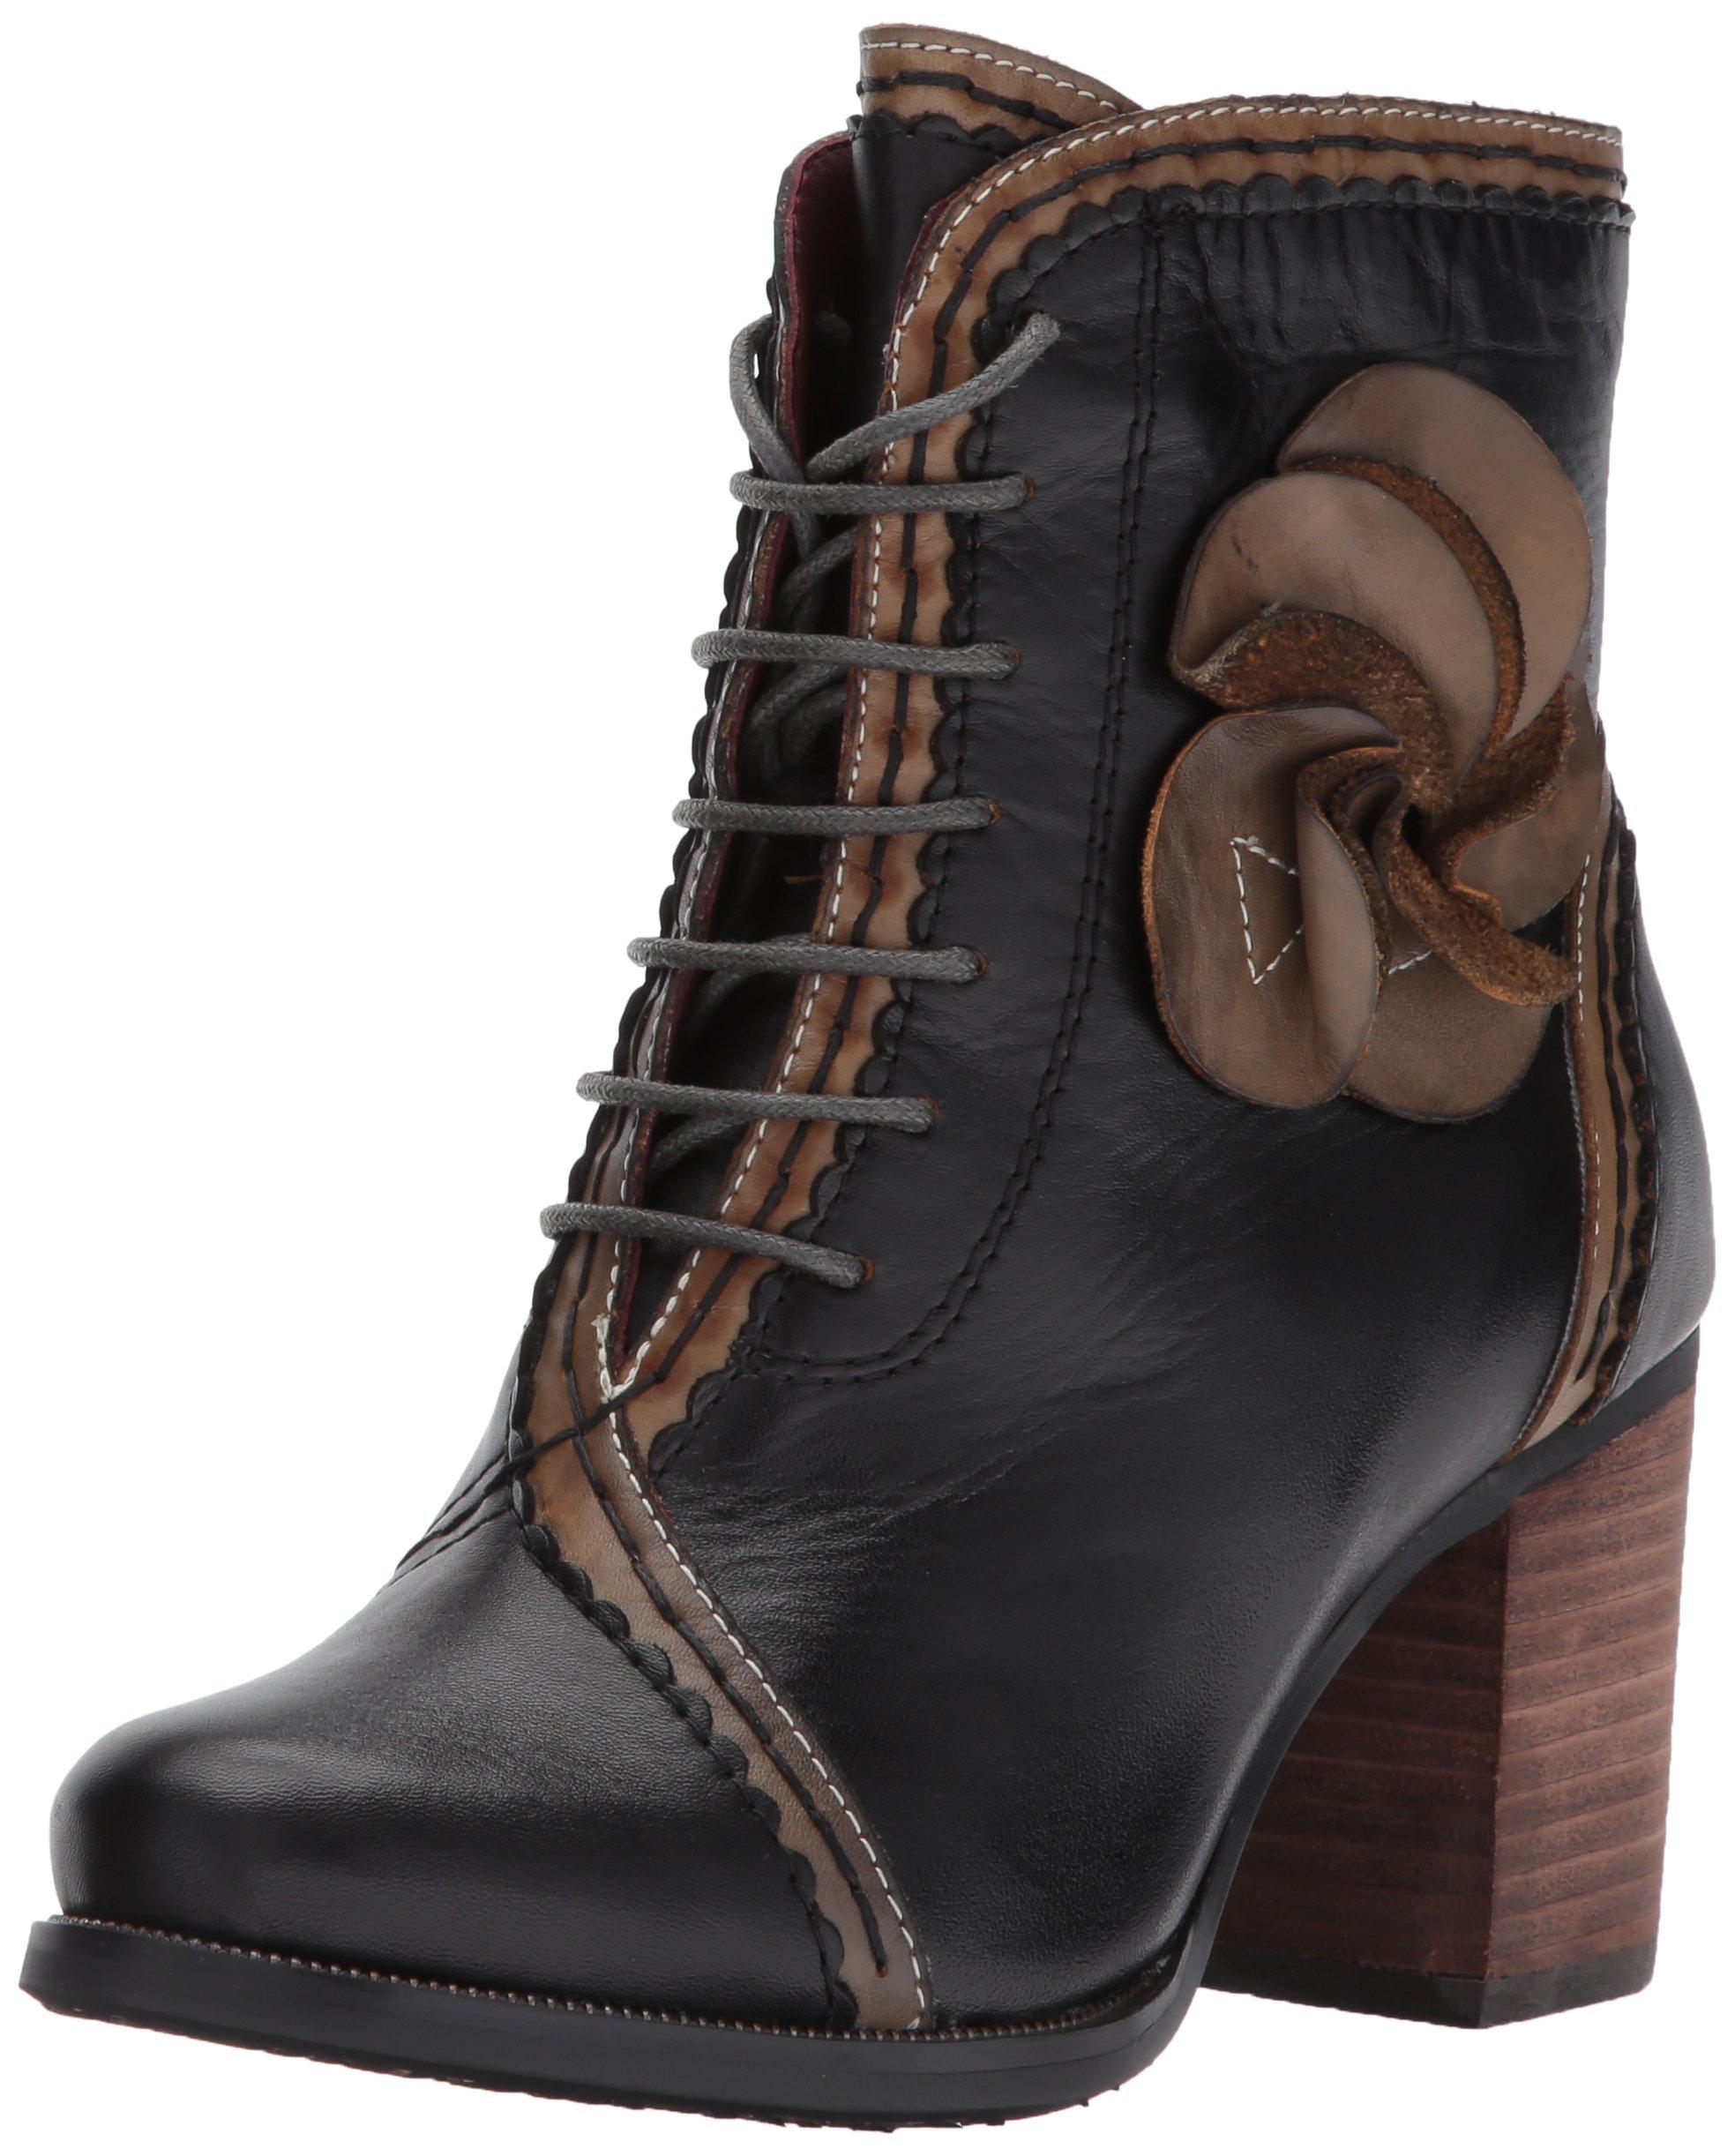 L'Artiste by Spring Step Women's Chrisanne Boot, Black, 40 EU/9 M US